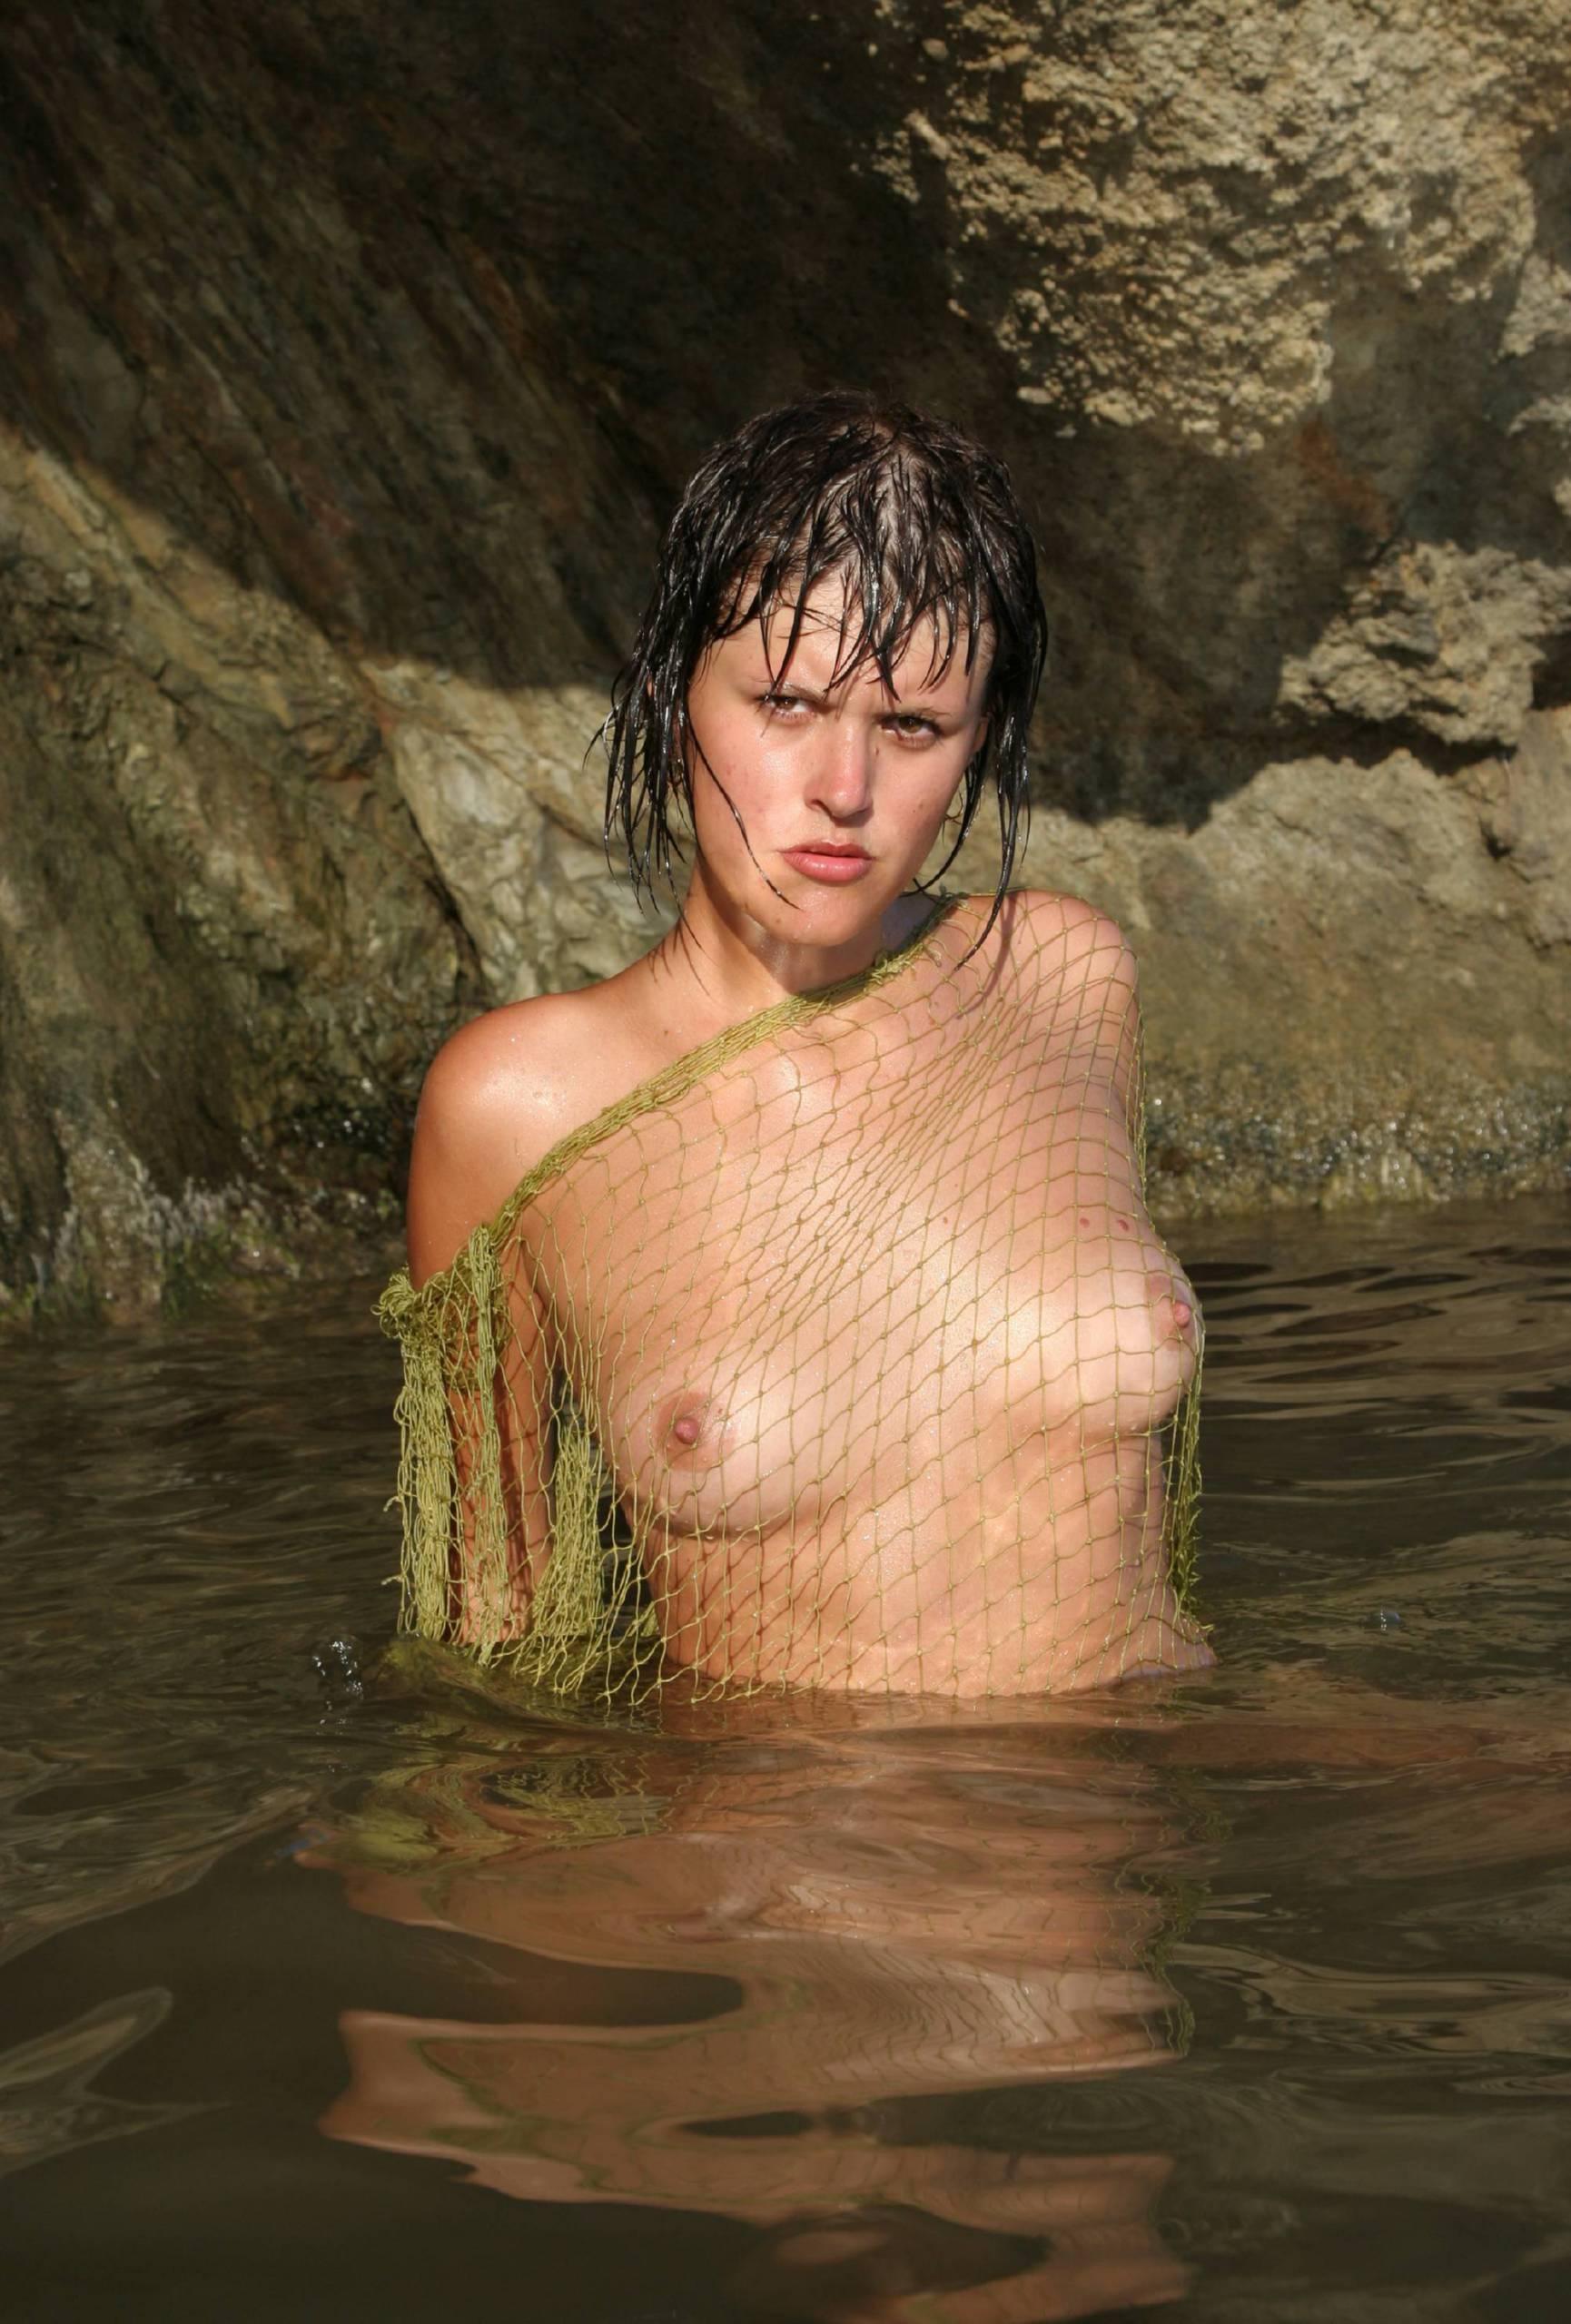 Nudist Photos Against Rocky Backdrops - 1